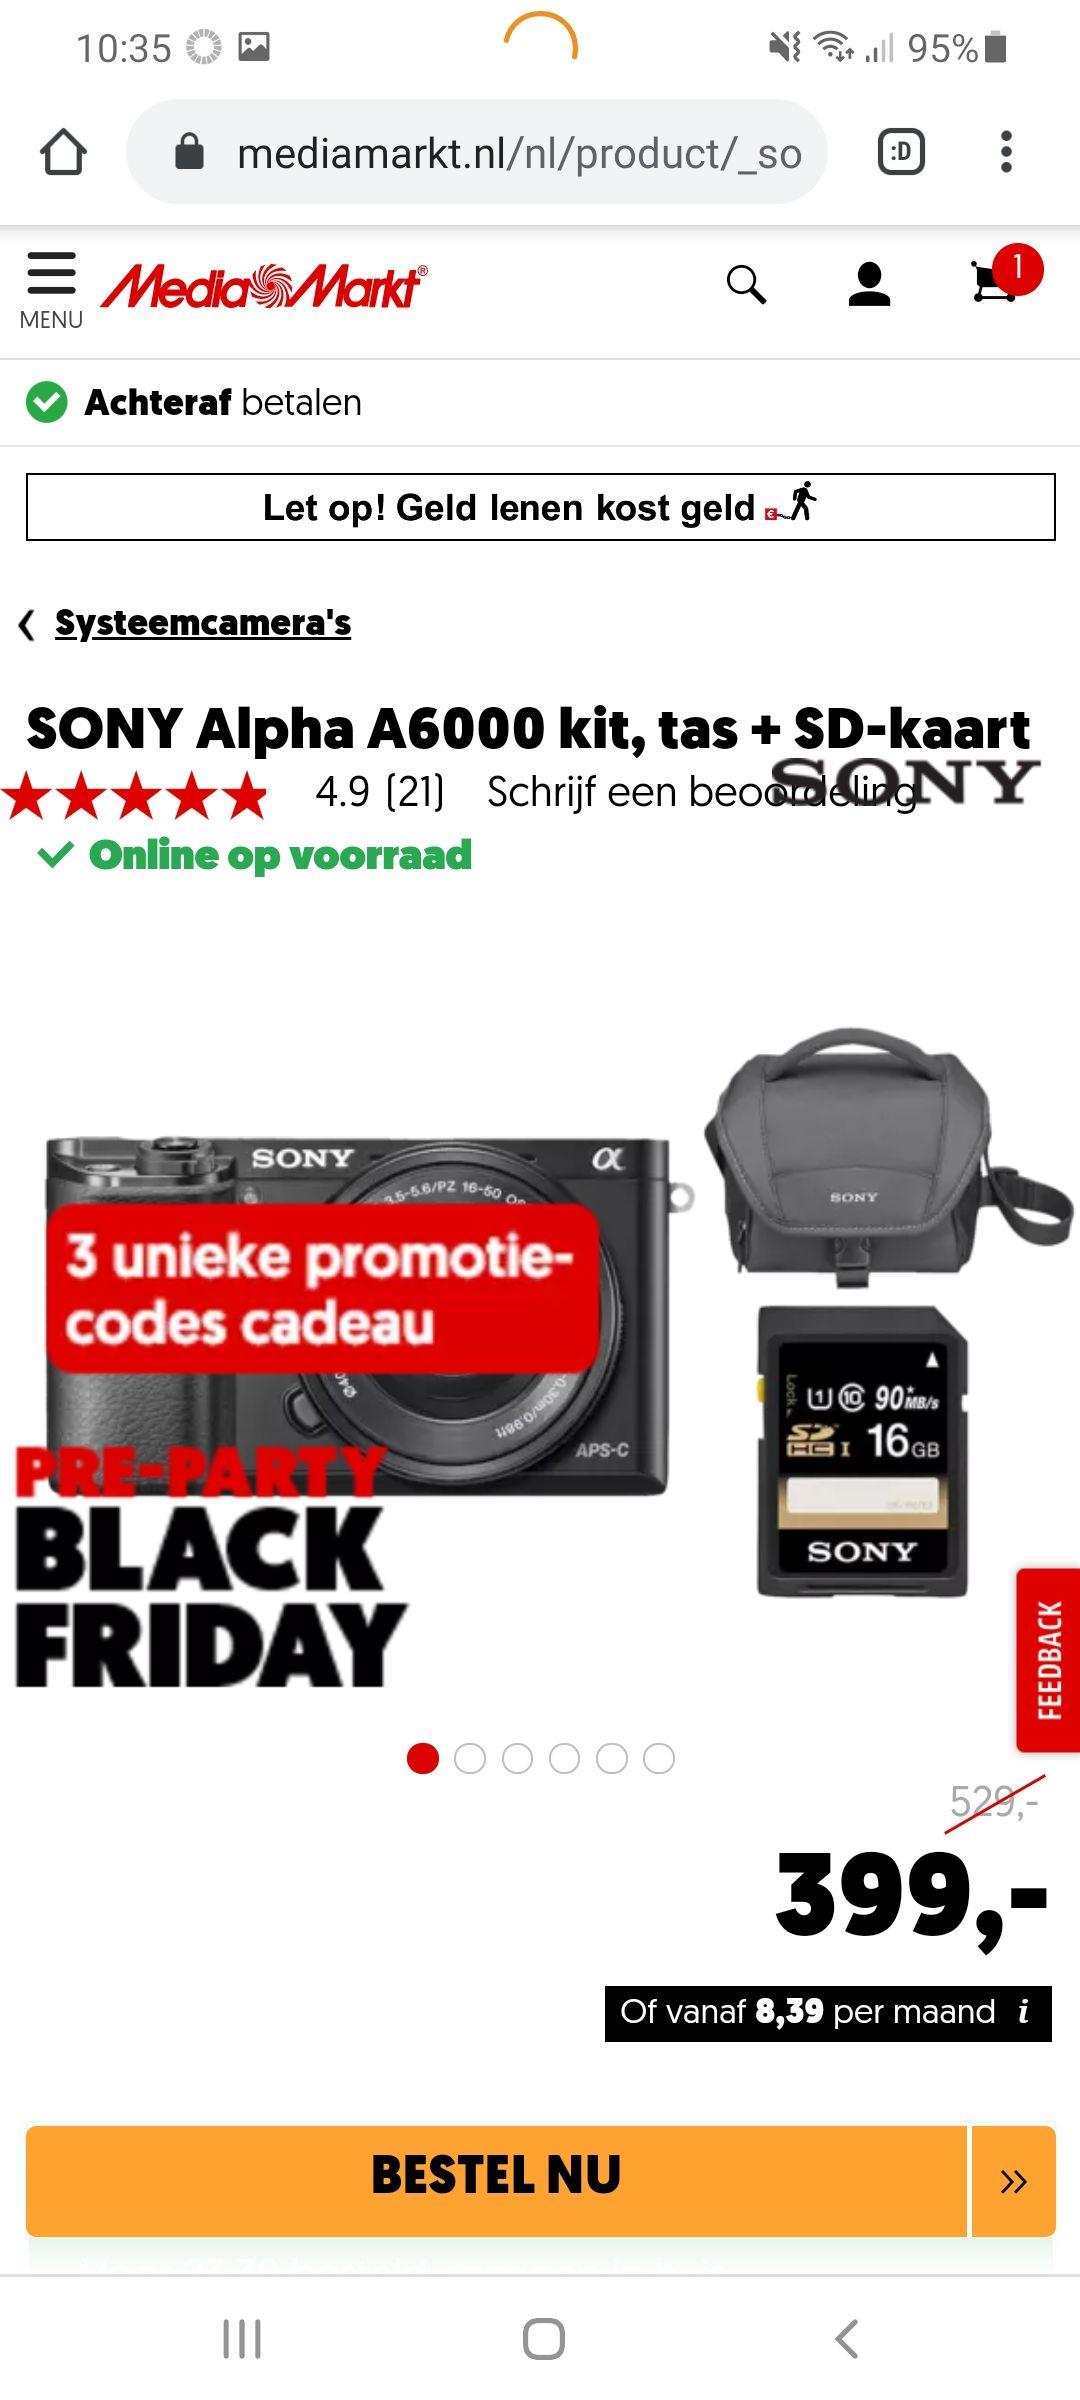 Sony a6000 kit + tas + SD kaart + Promotiecodes